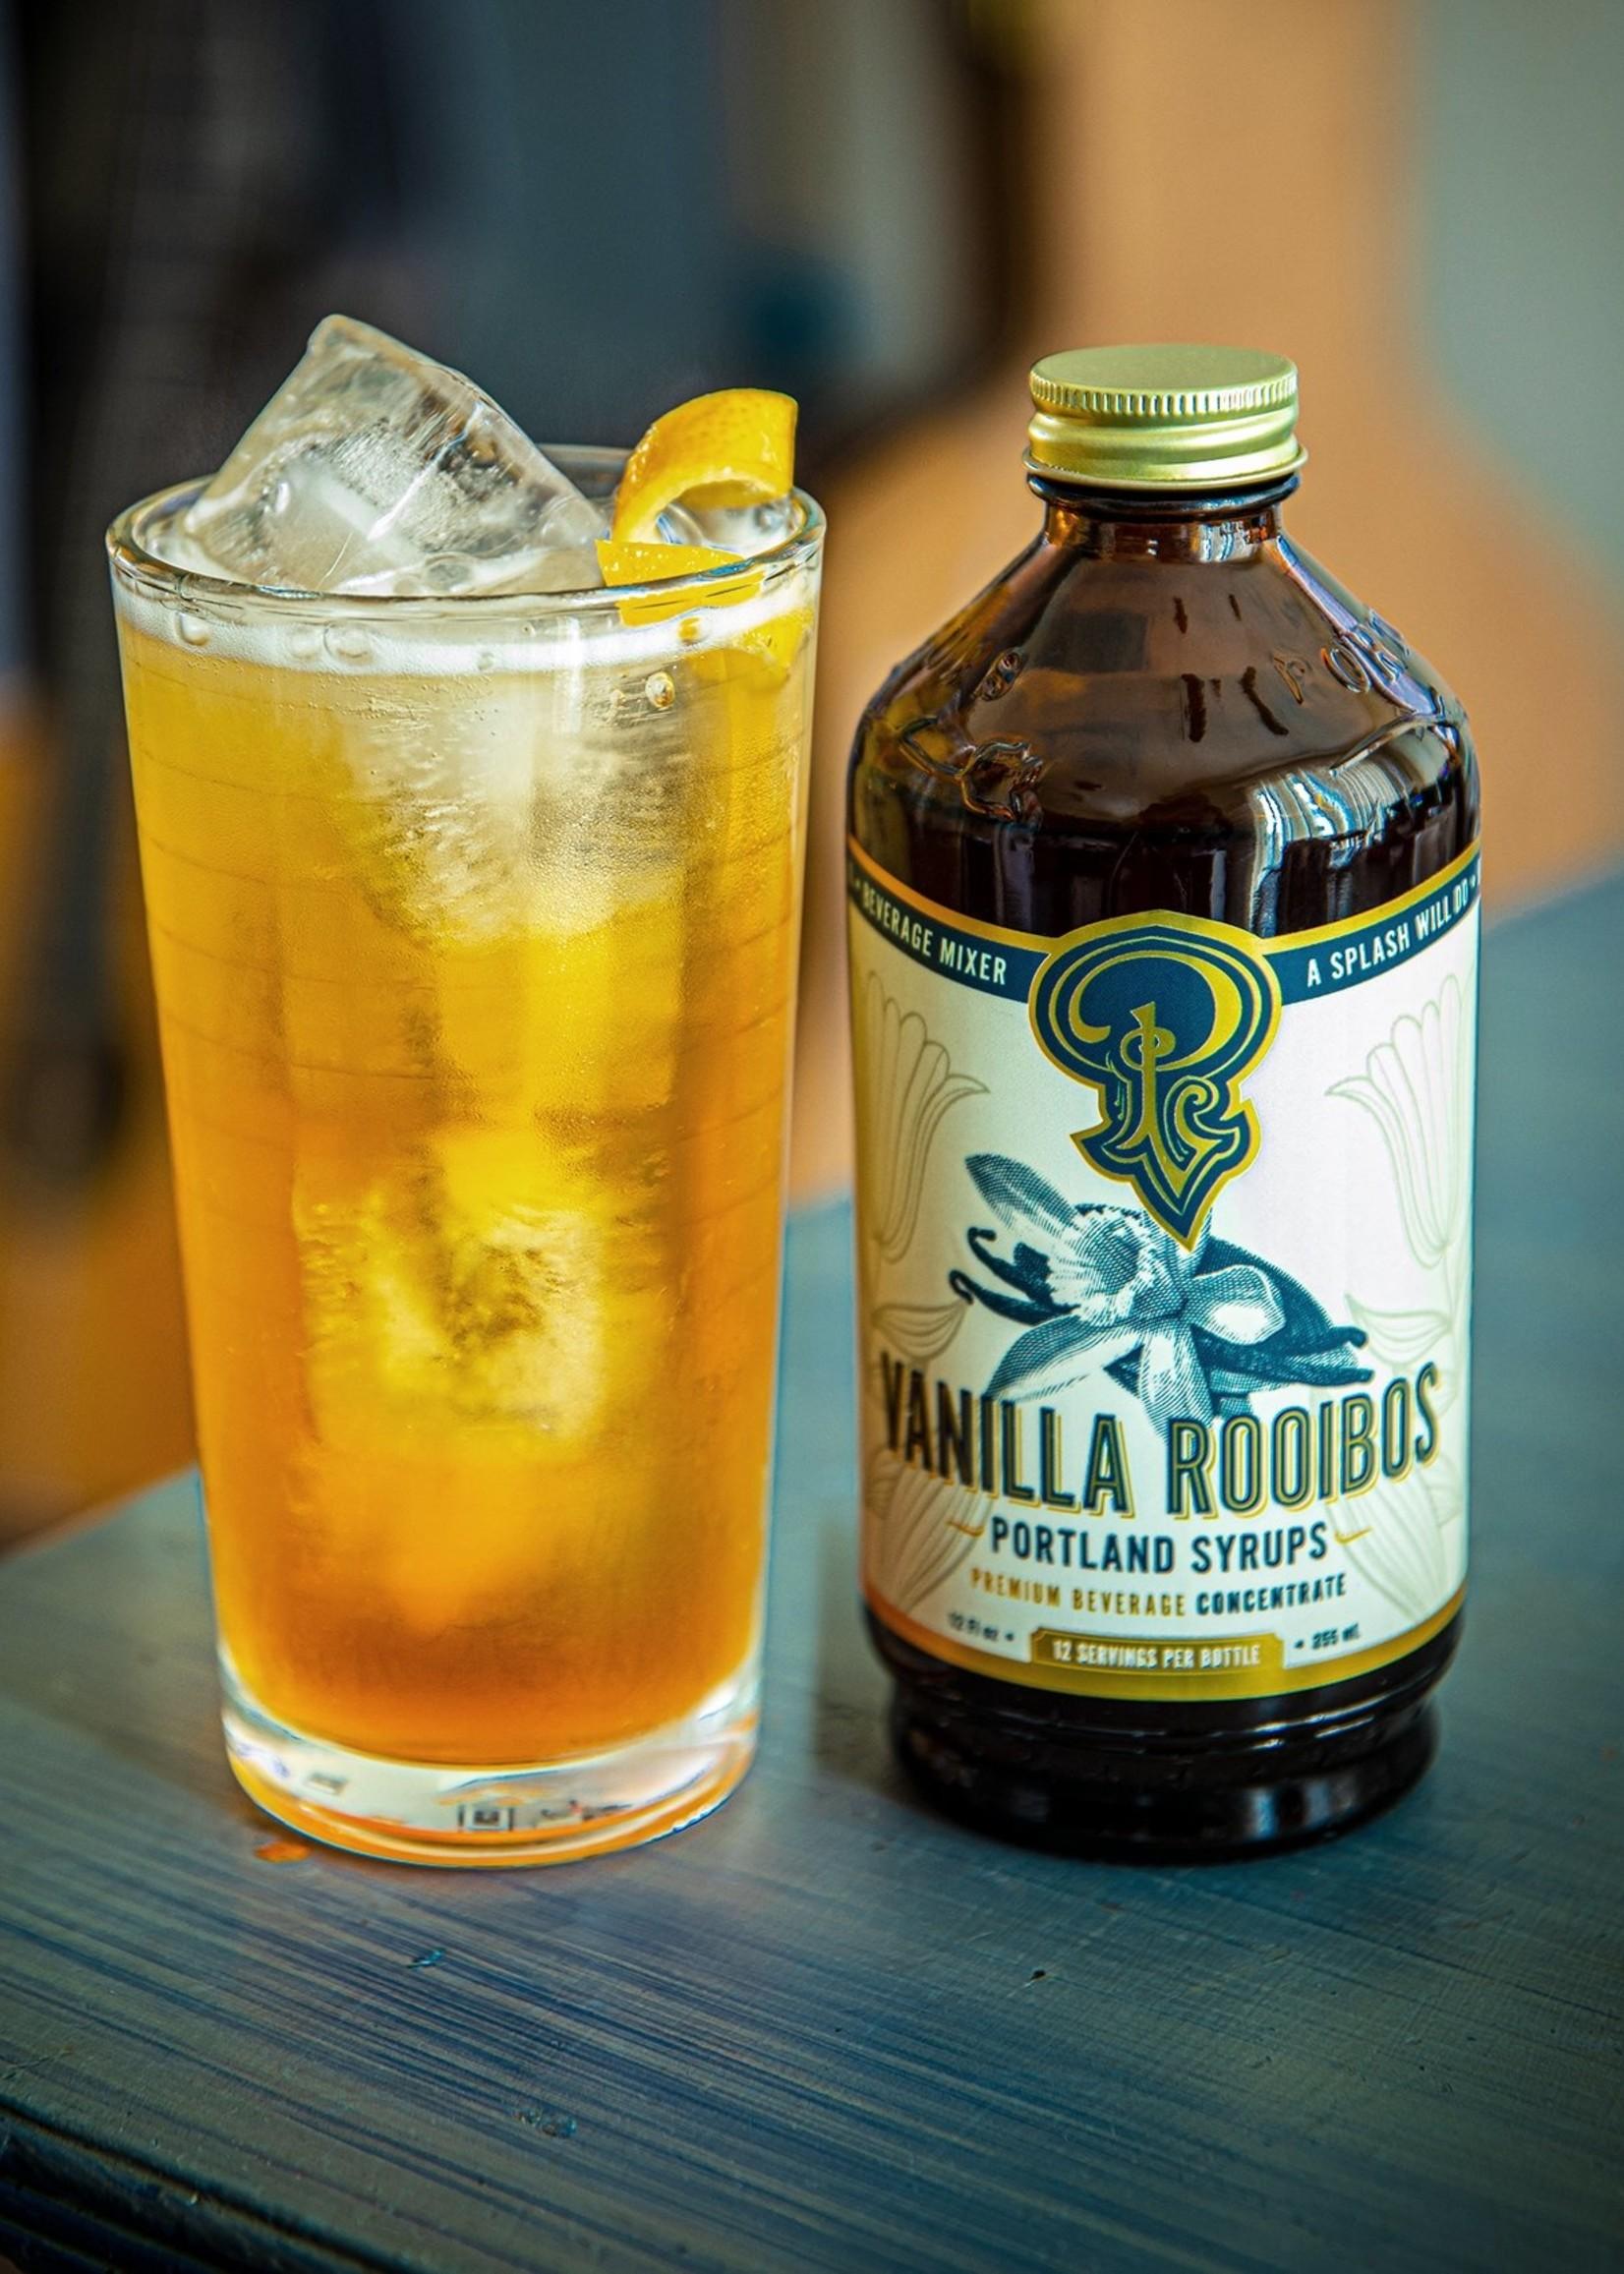 Portland Syrups Vanilla Spice Roobois Syrup